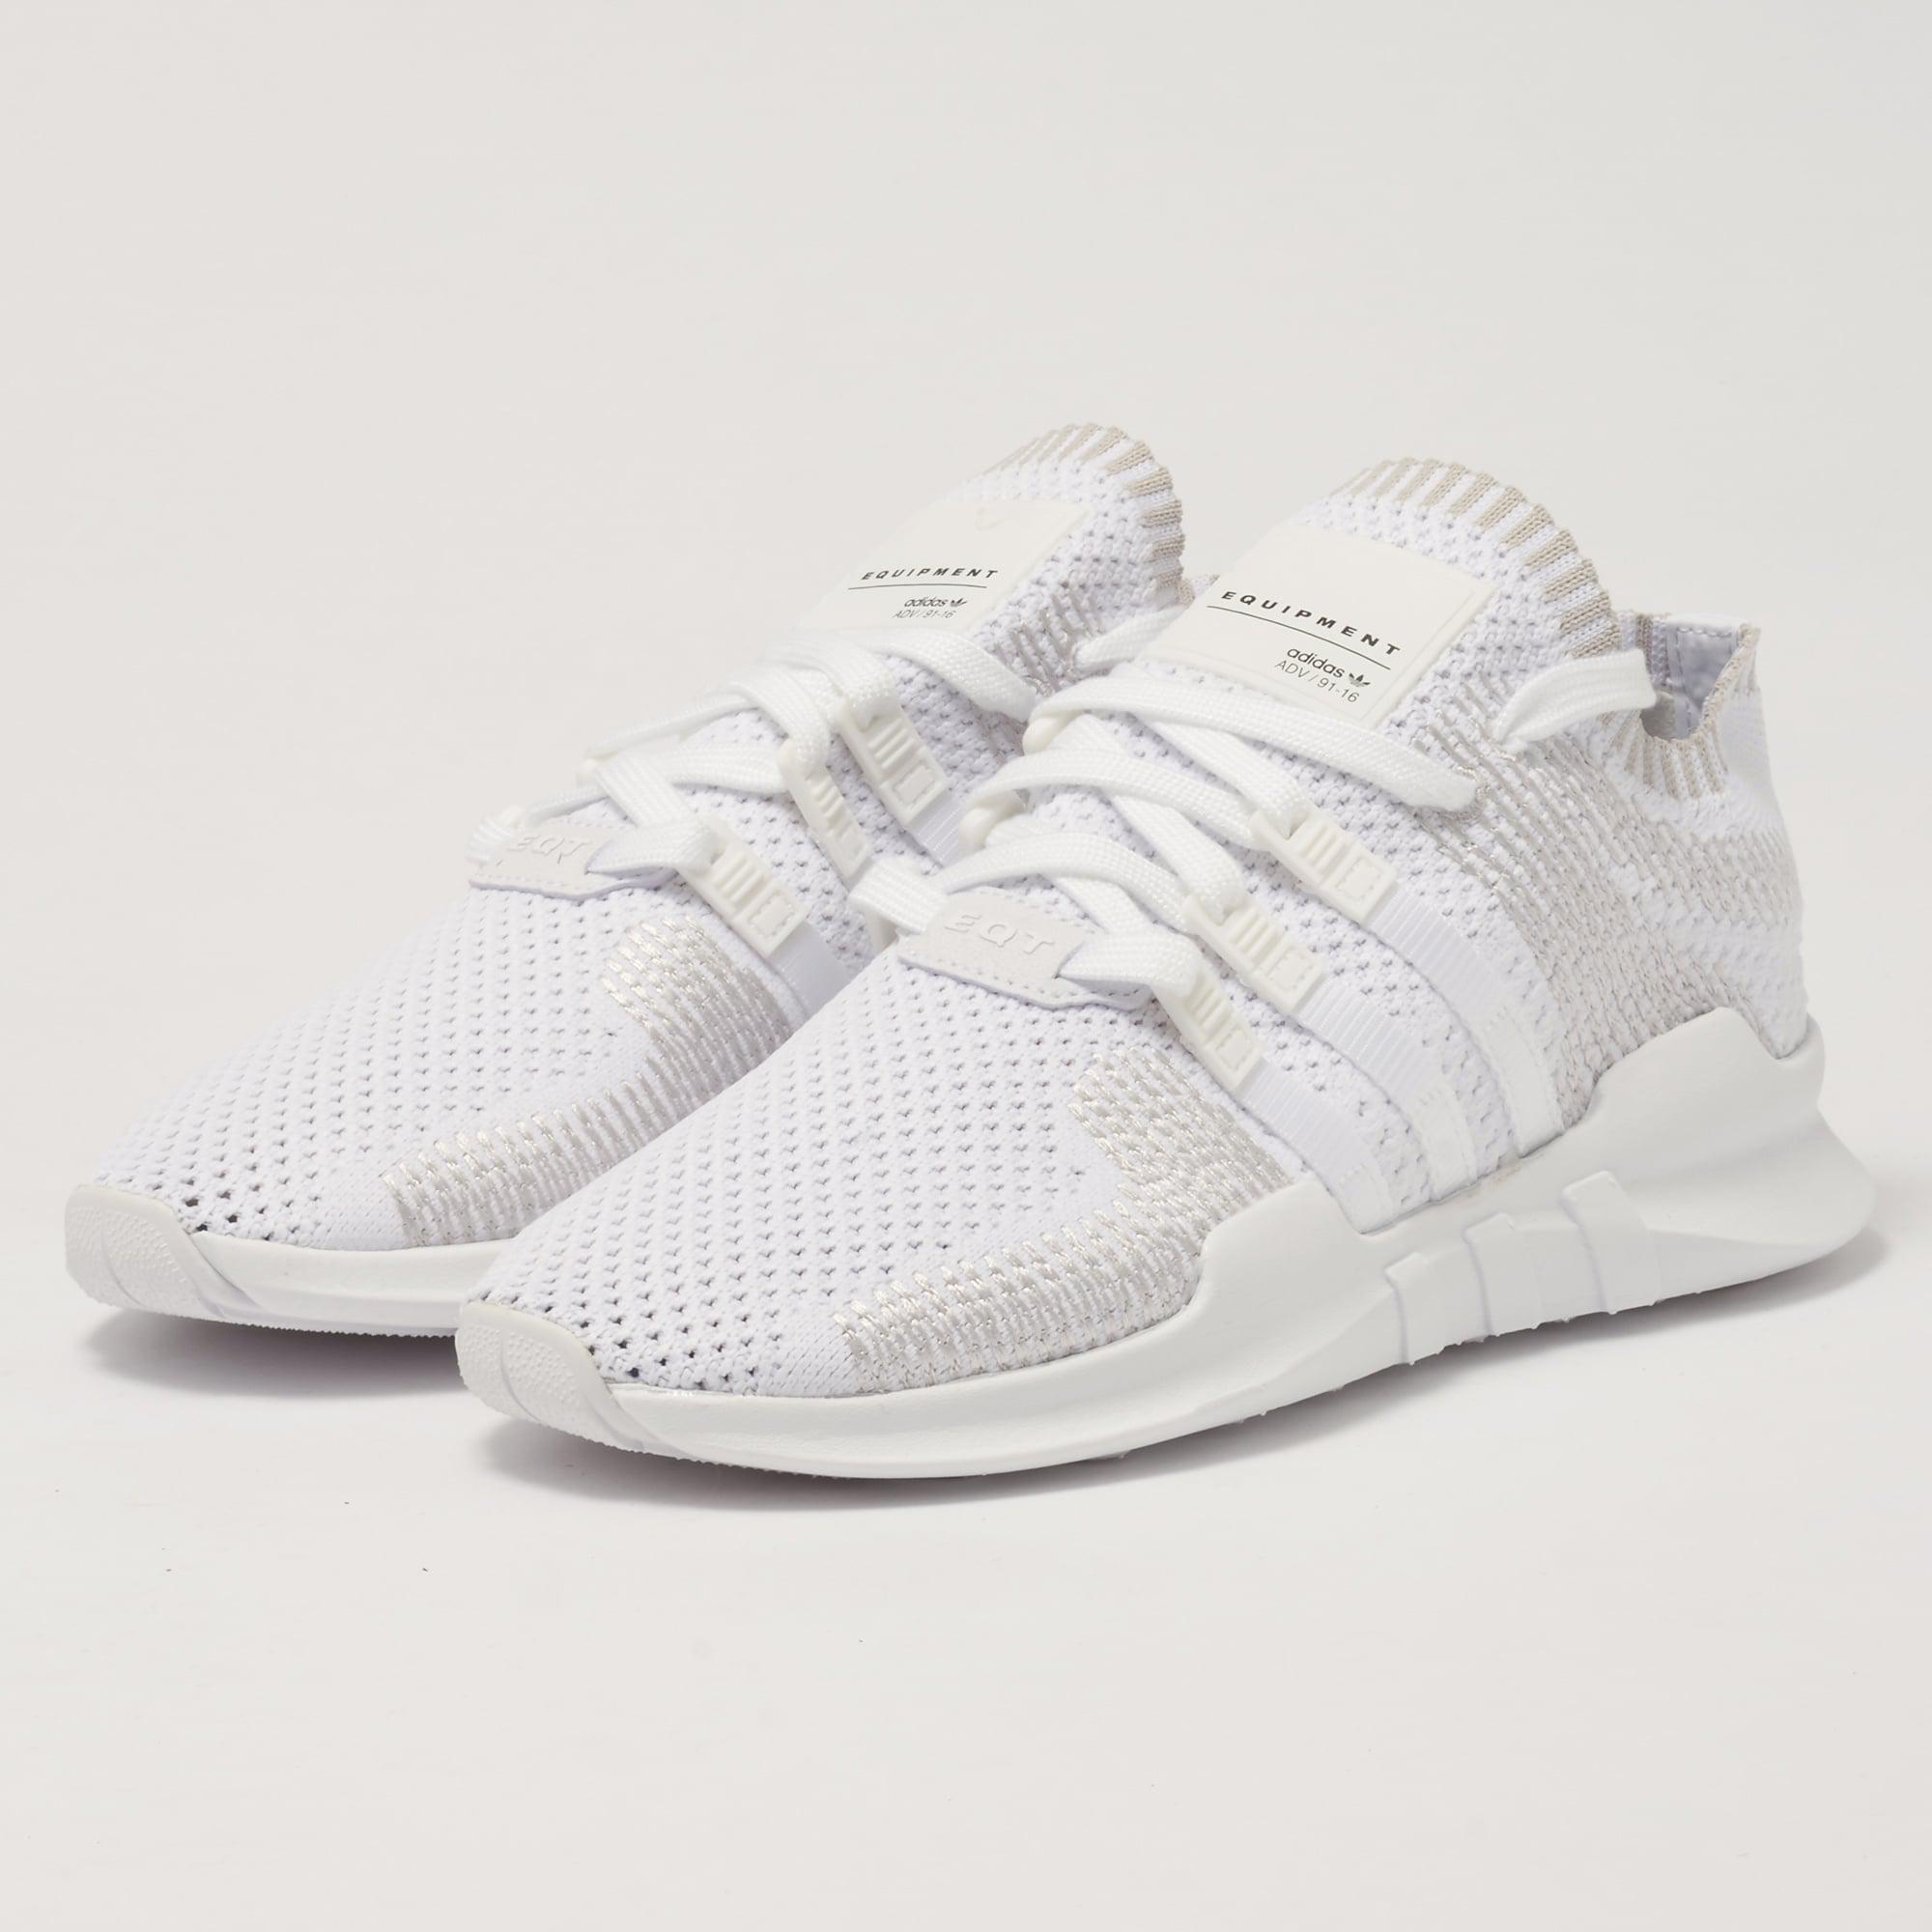 Adidas bianca Originals Eqt Support Adv Primeknit Footwear bianca in bianca Adidas   0259fe